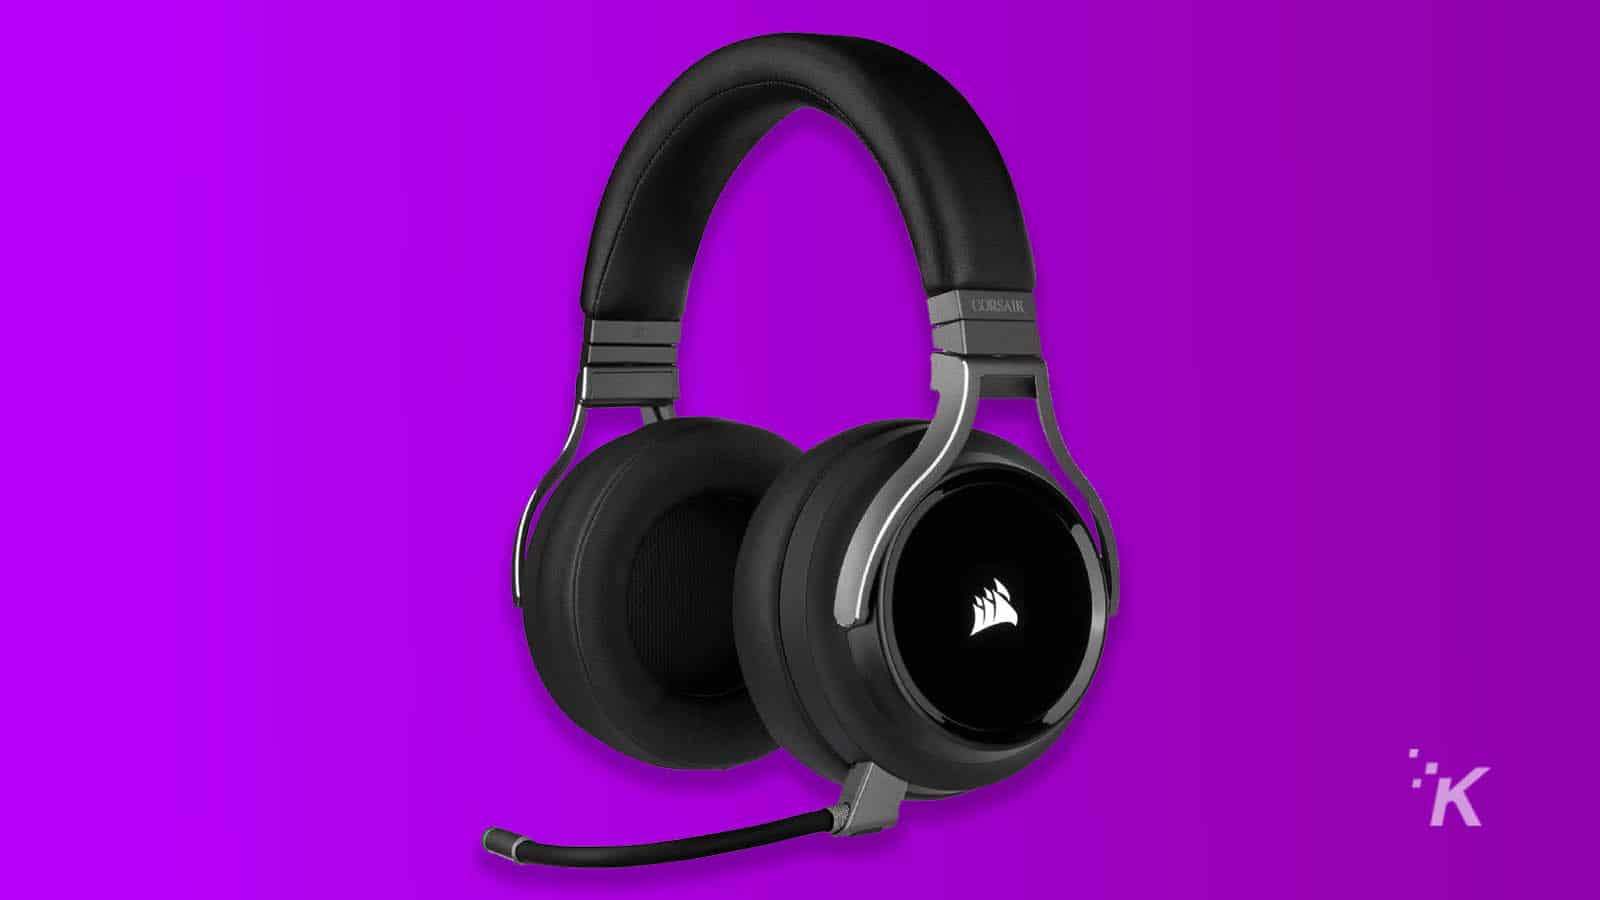 corsair gaming headset on purple background